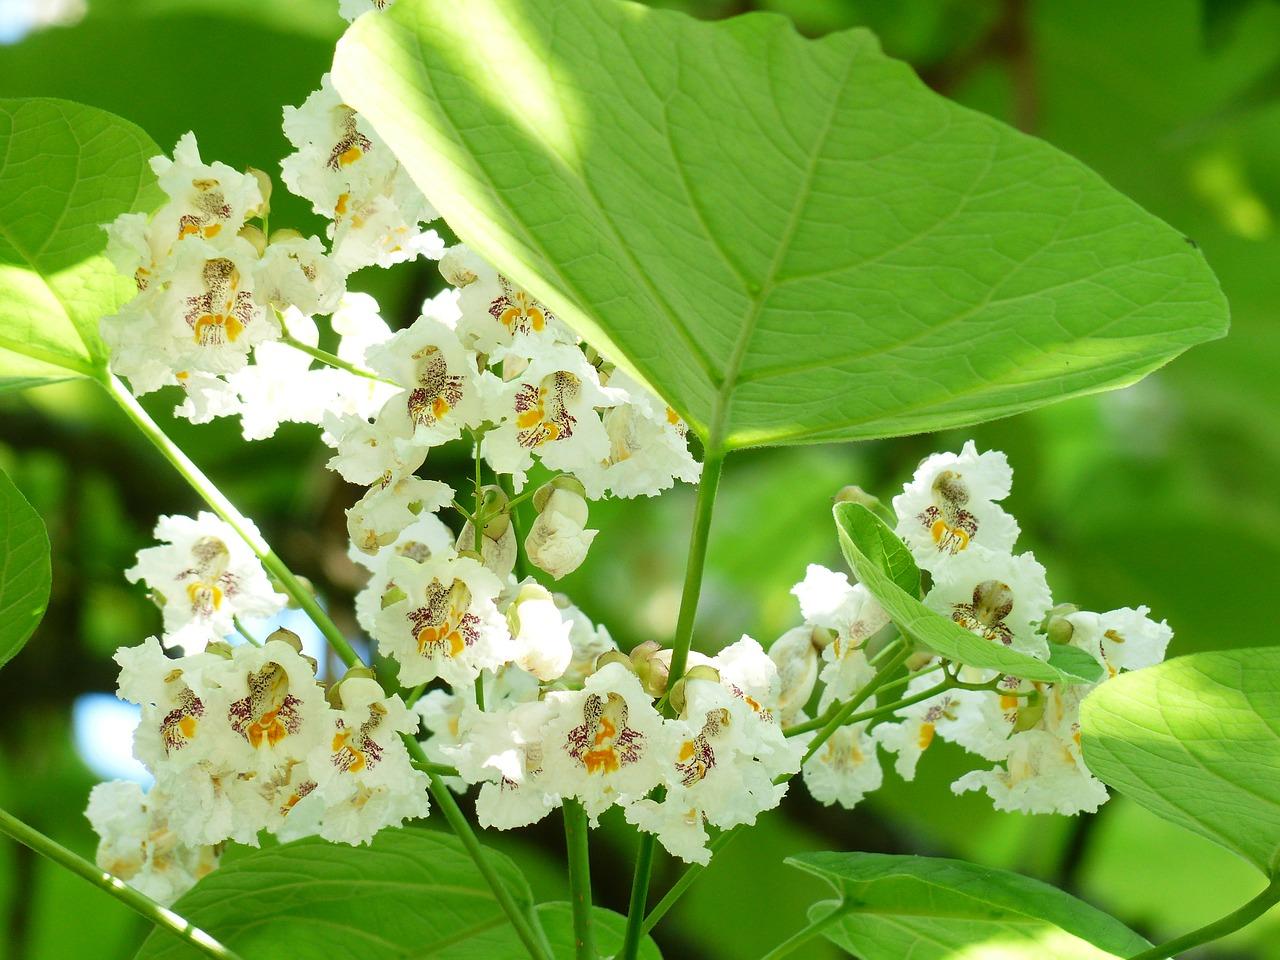 catalpa bloem en blad tuincursus online